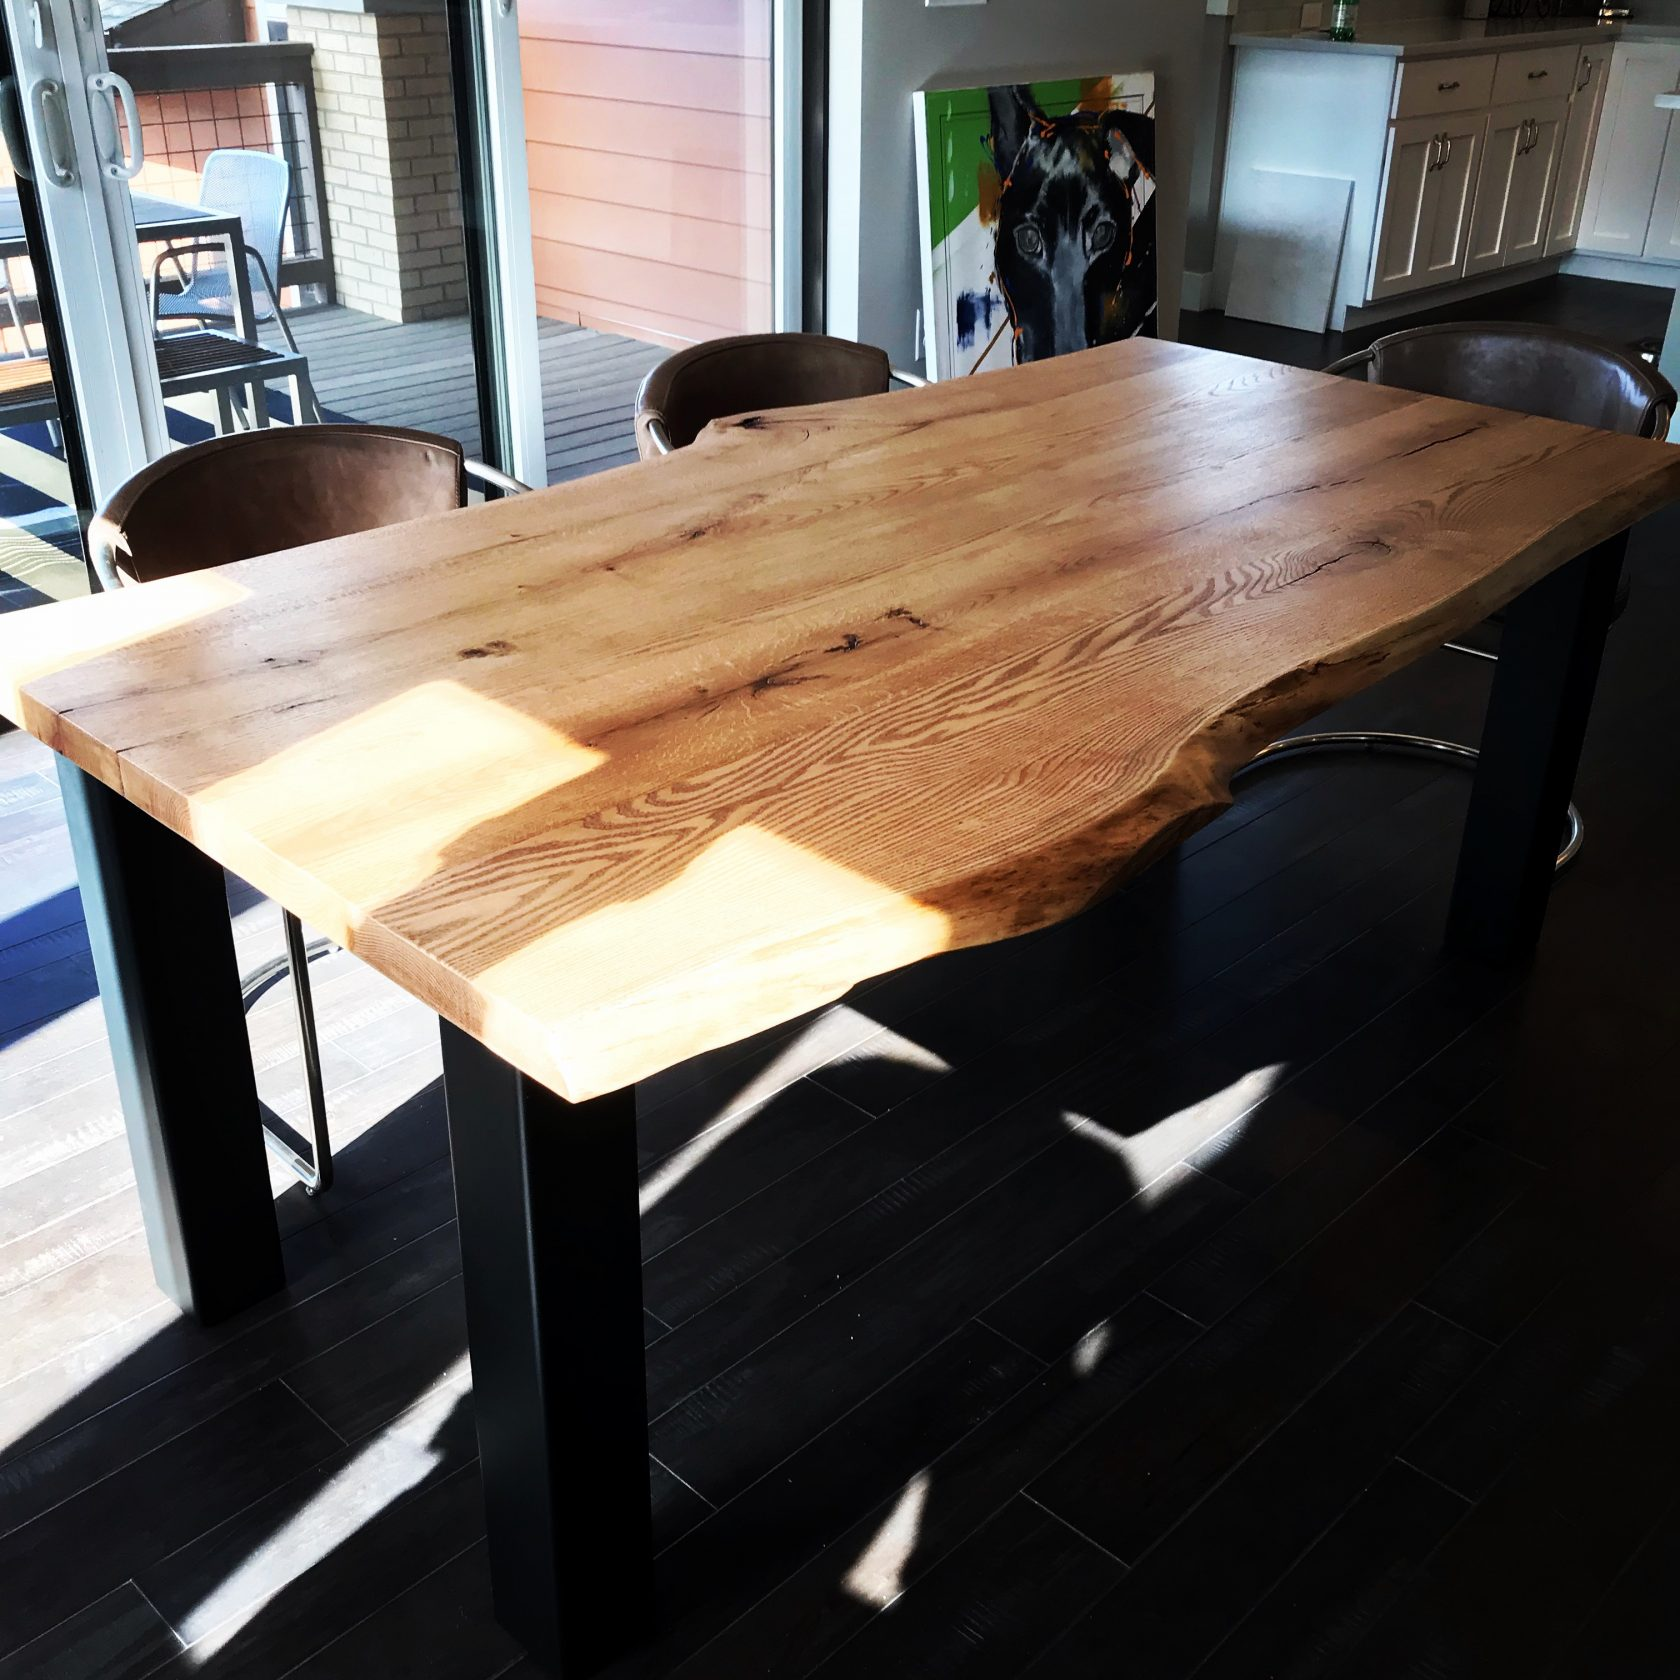 Tremendous Paulo Silva Fine Art Design Live Edge Oak Dining Table Home Interior And Landscaping Sapresignezvosmurscom